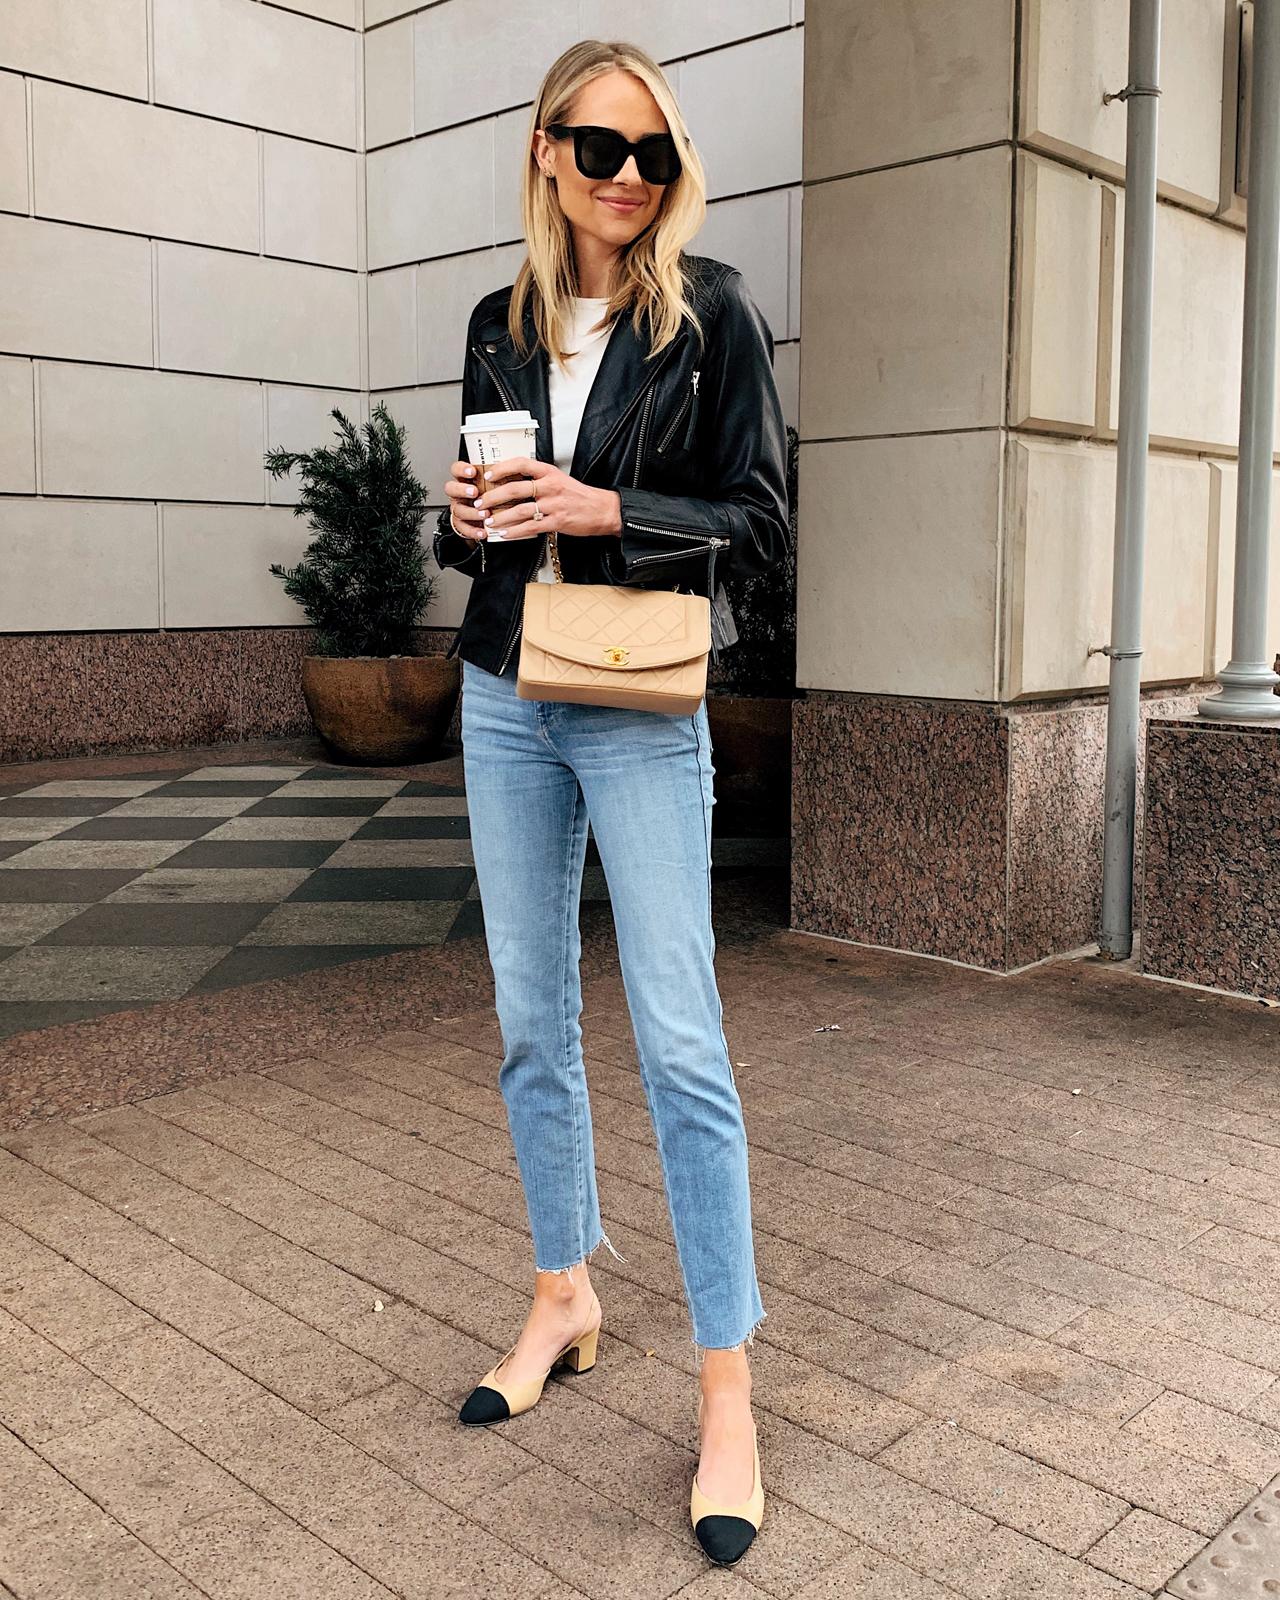 Fashion Jackson Topshop Black Leather Jacket White Top Frame Raw Hem Jeans Chanel Slingbacks Chanel Beige Classic Handbag